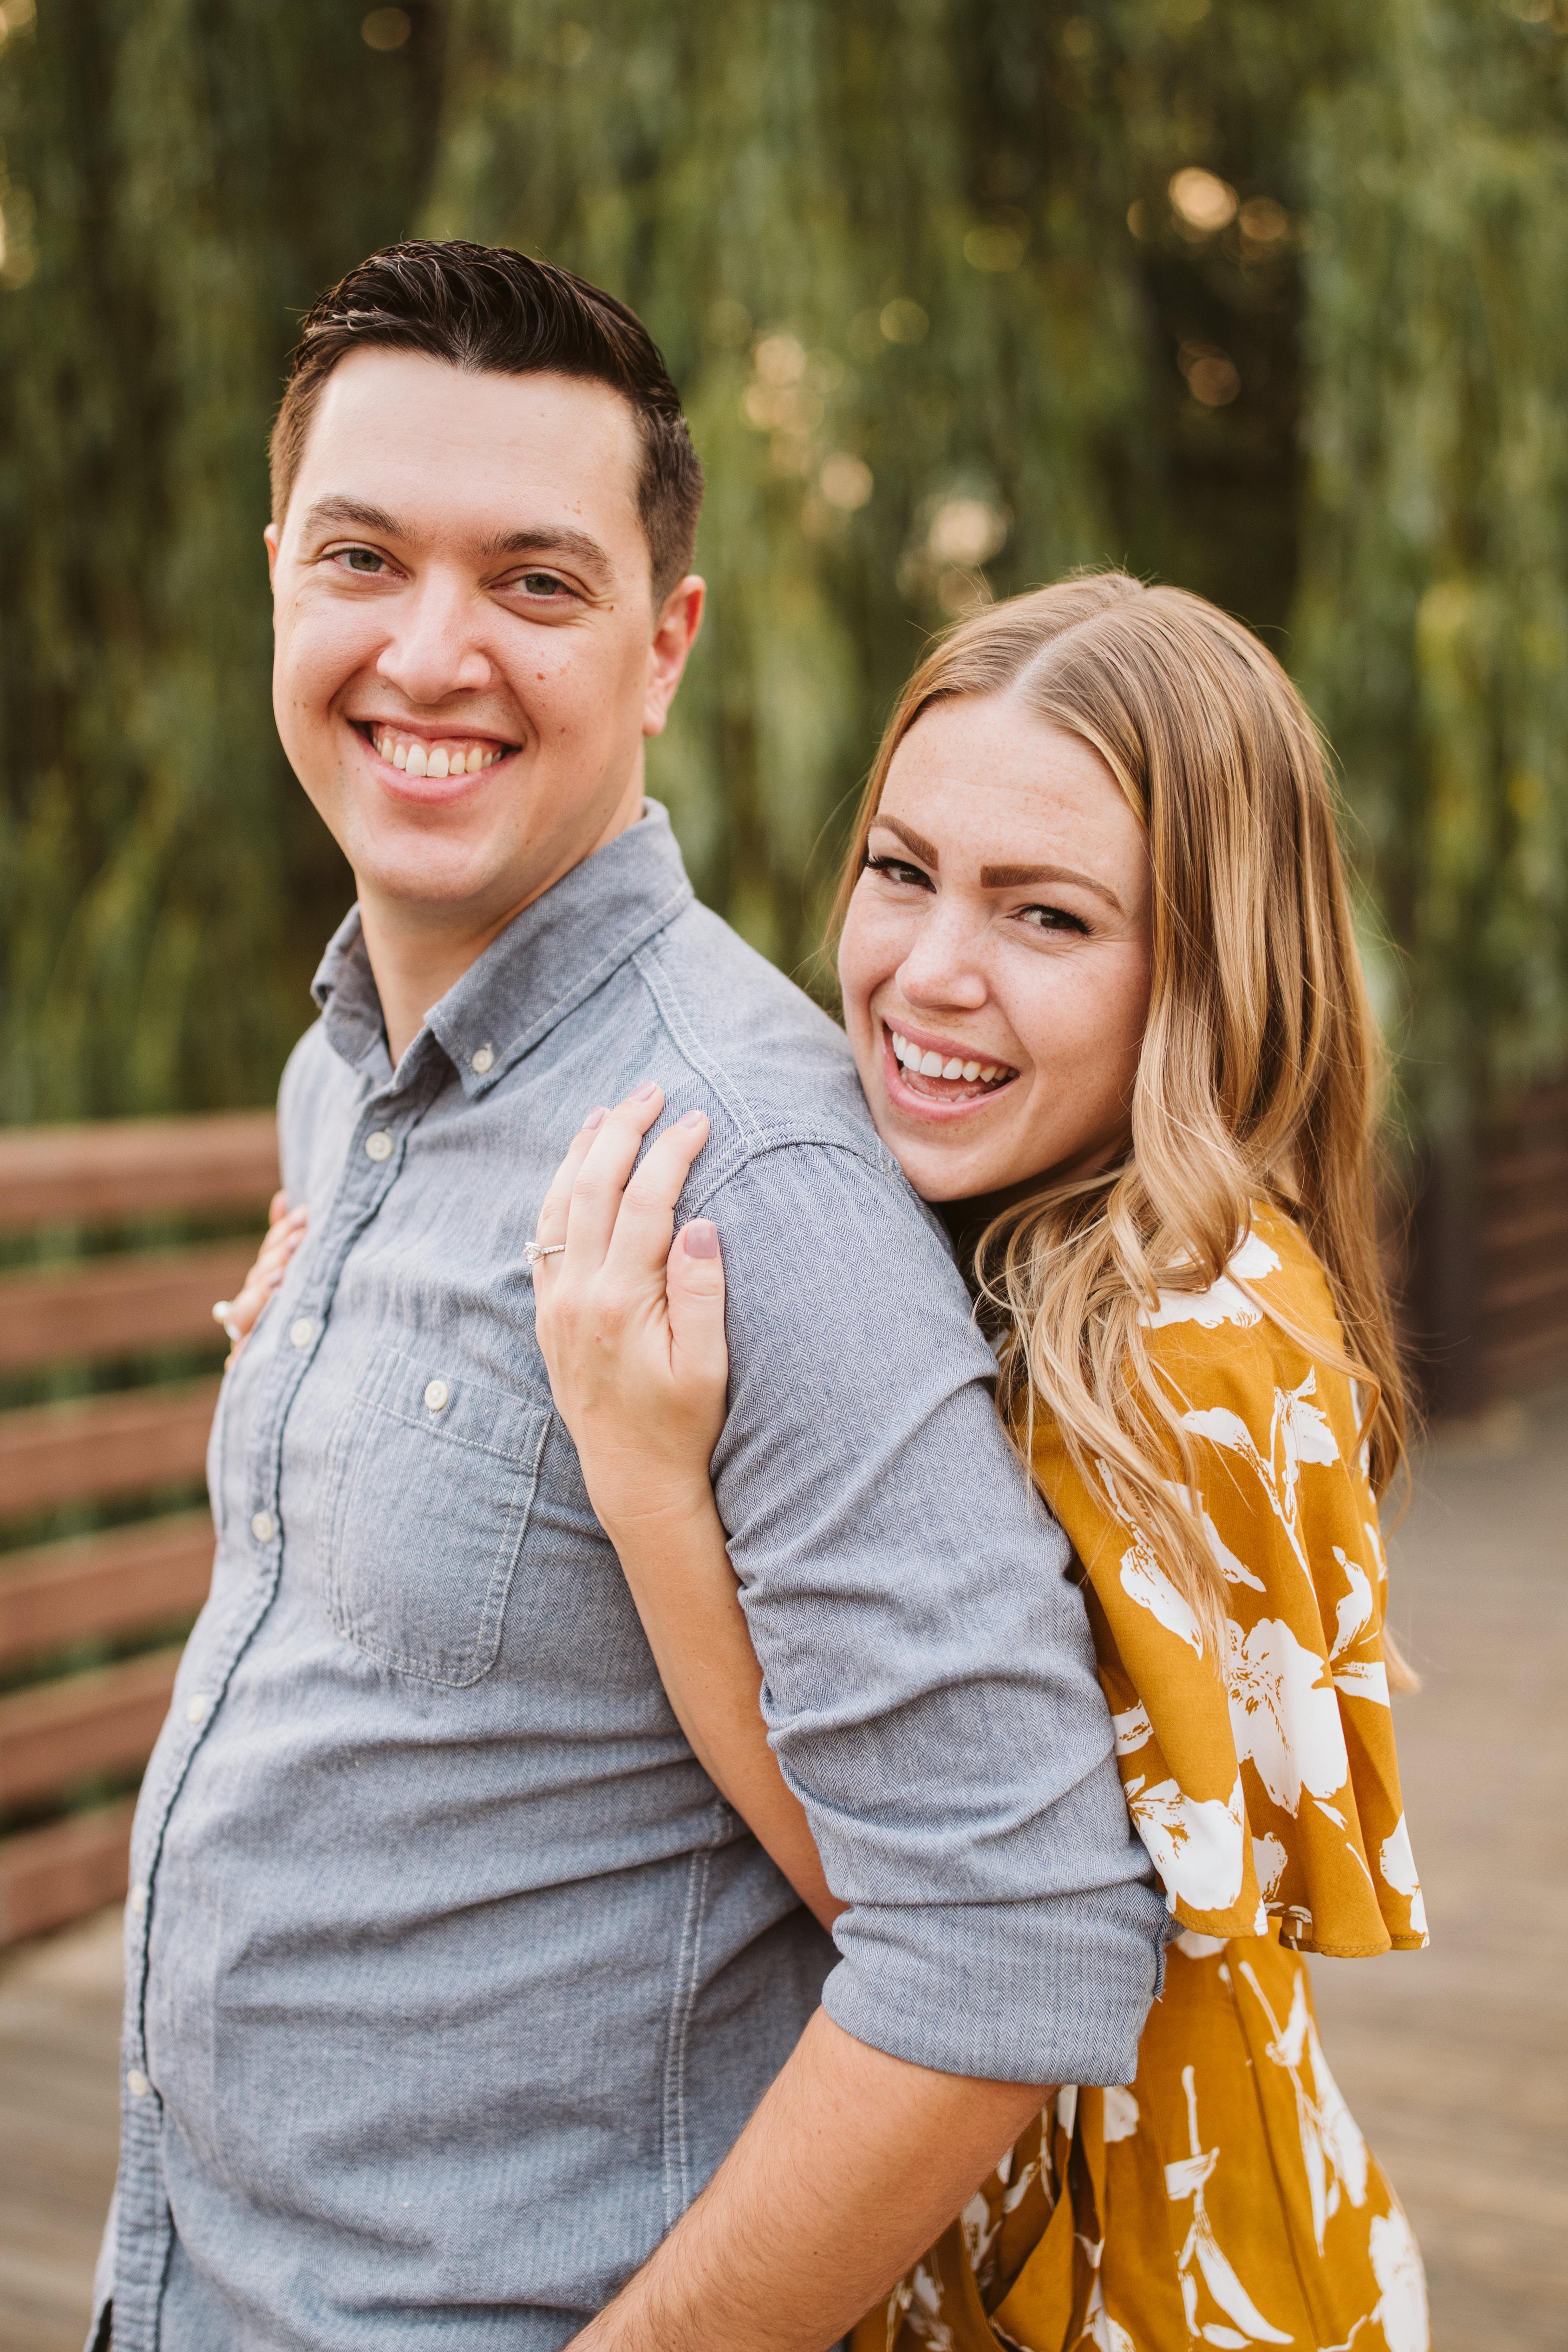 spokane engagement photography